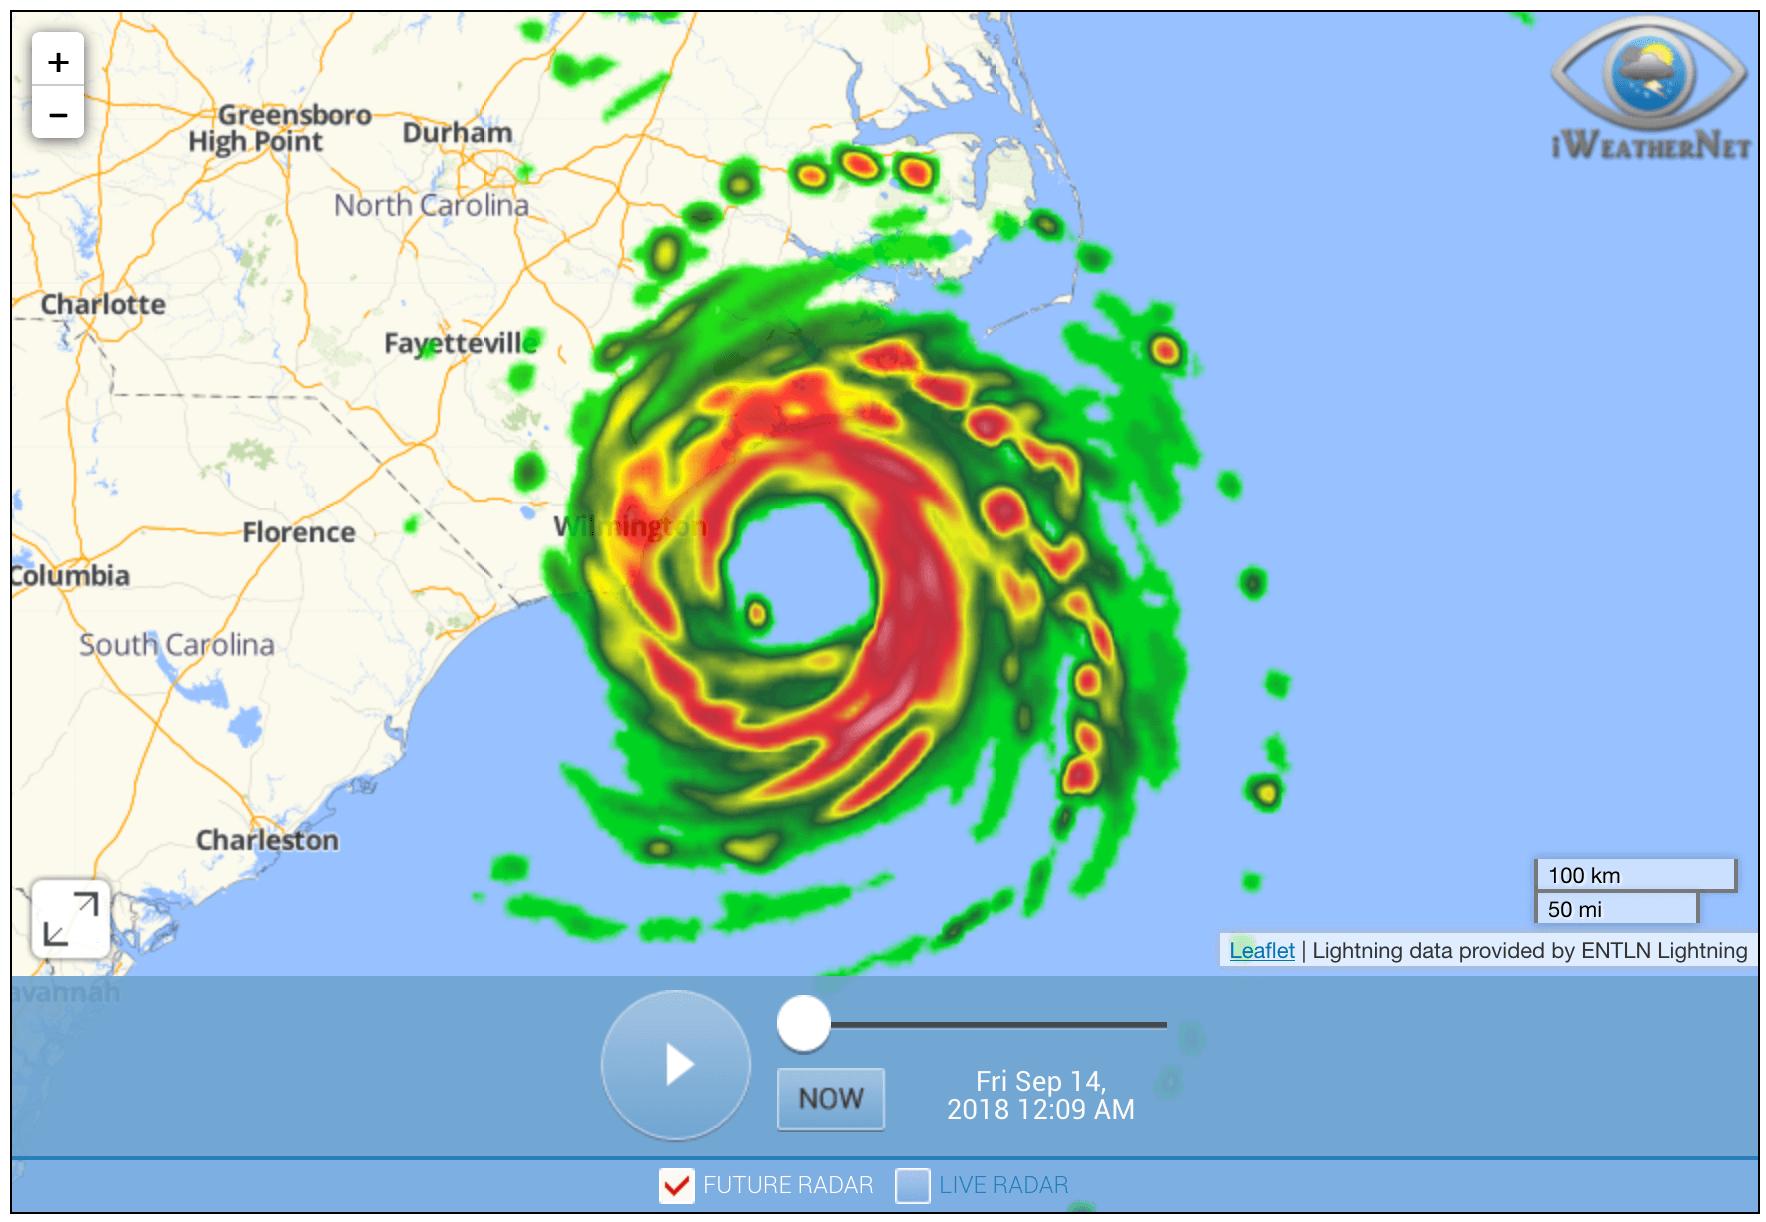 Interactive Future Radar Forecast Next 12 To 72 Hours - Radar Map For Houston Texas